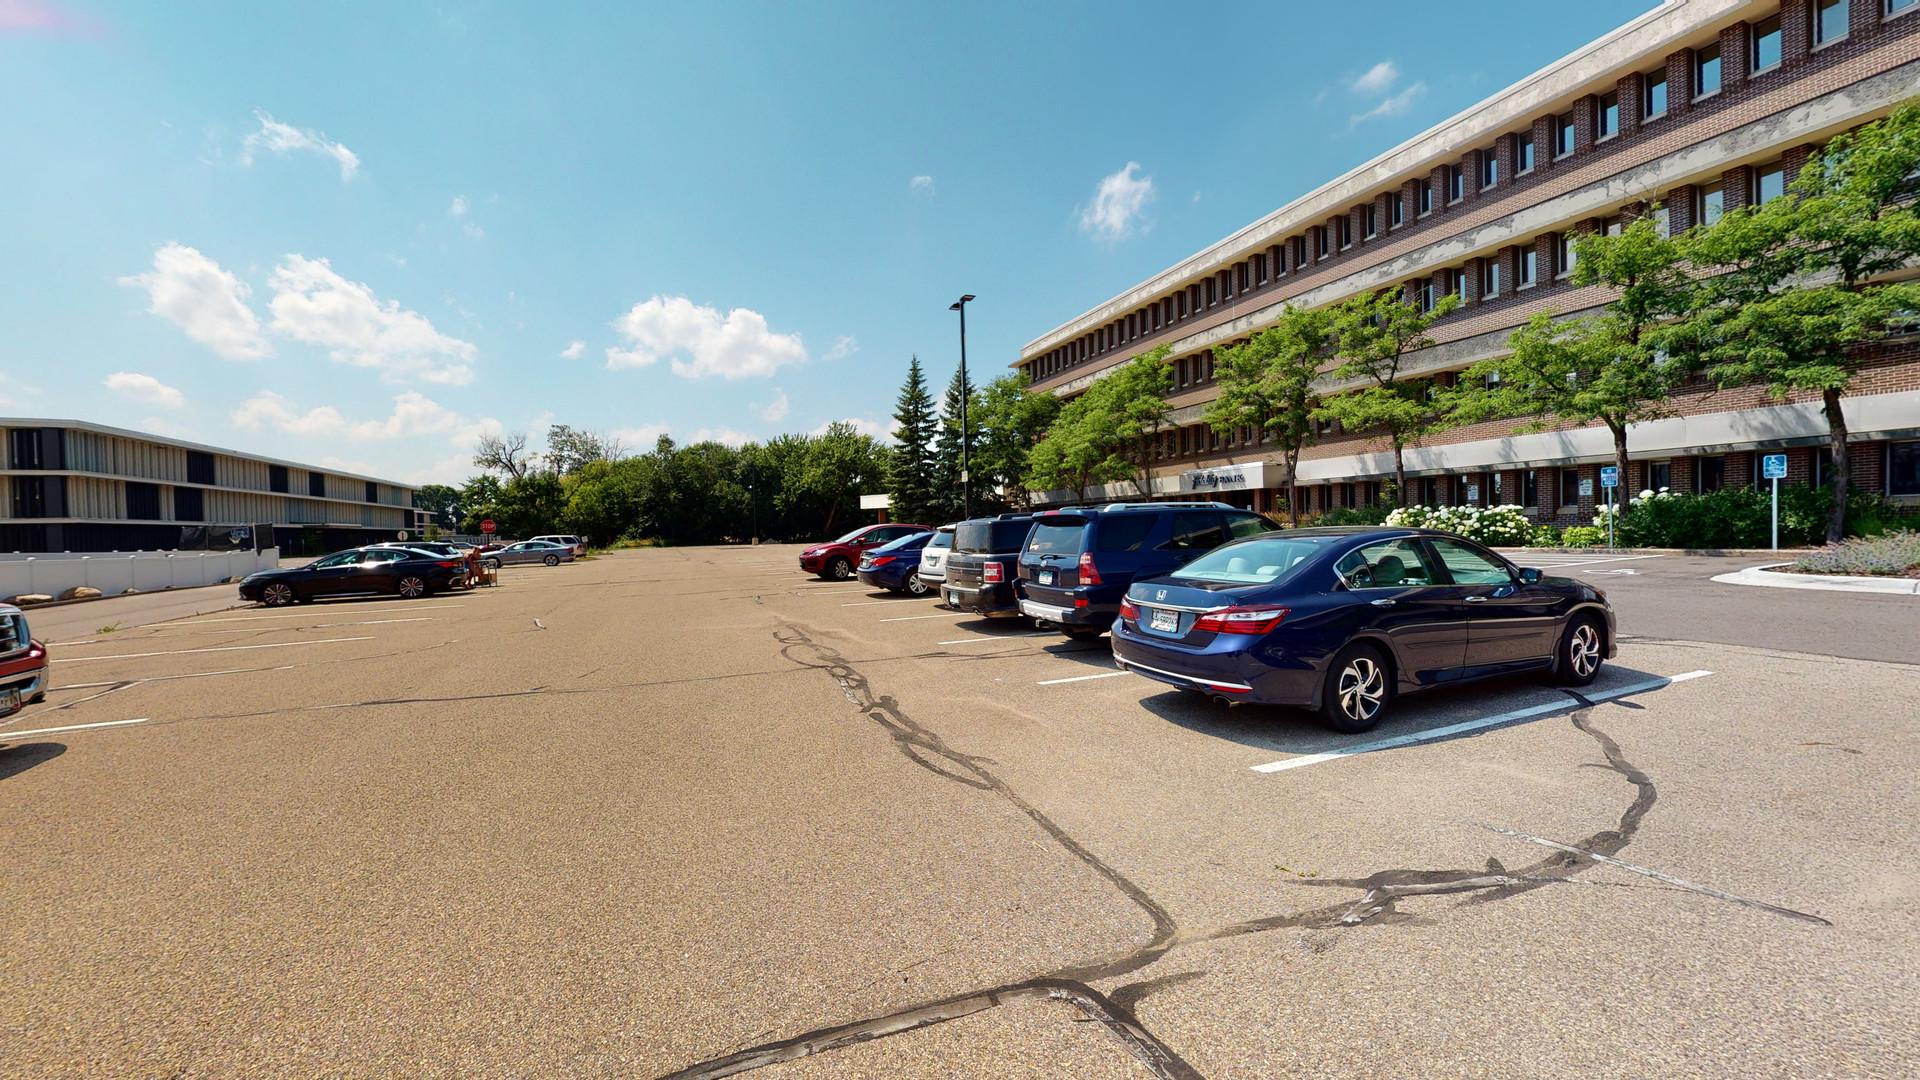 7600 parking